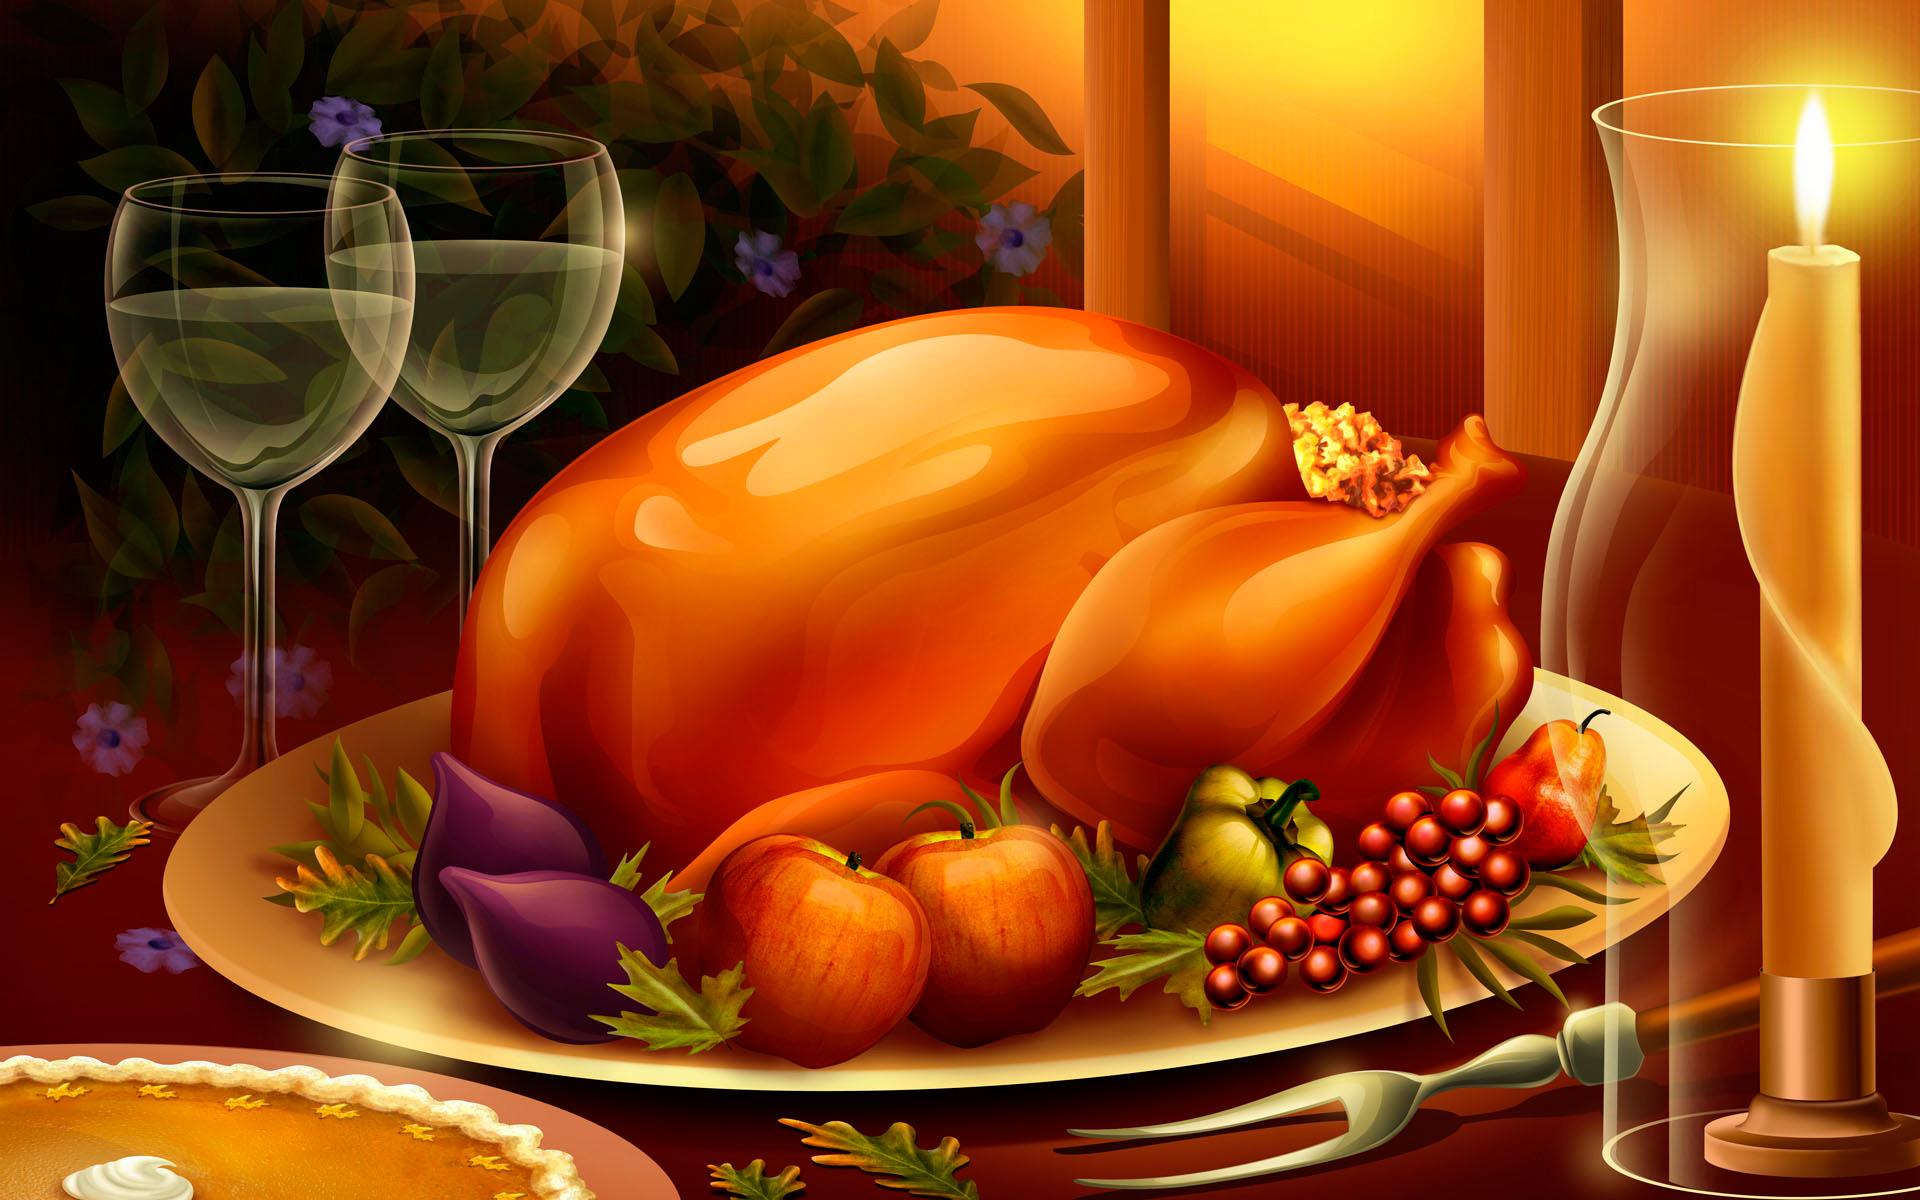 Thanksgiving Wallpaper Download Desktop Thanksgiving Wallpaper 1920x1200